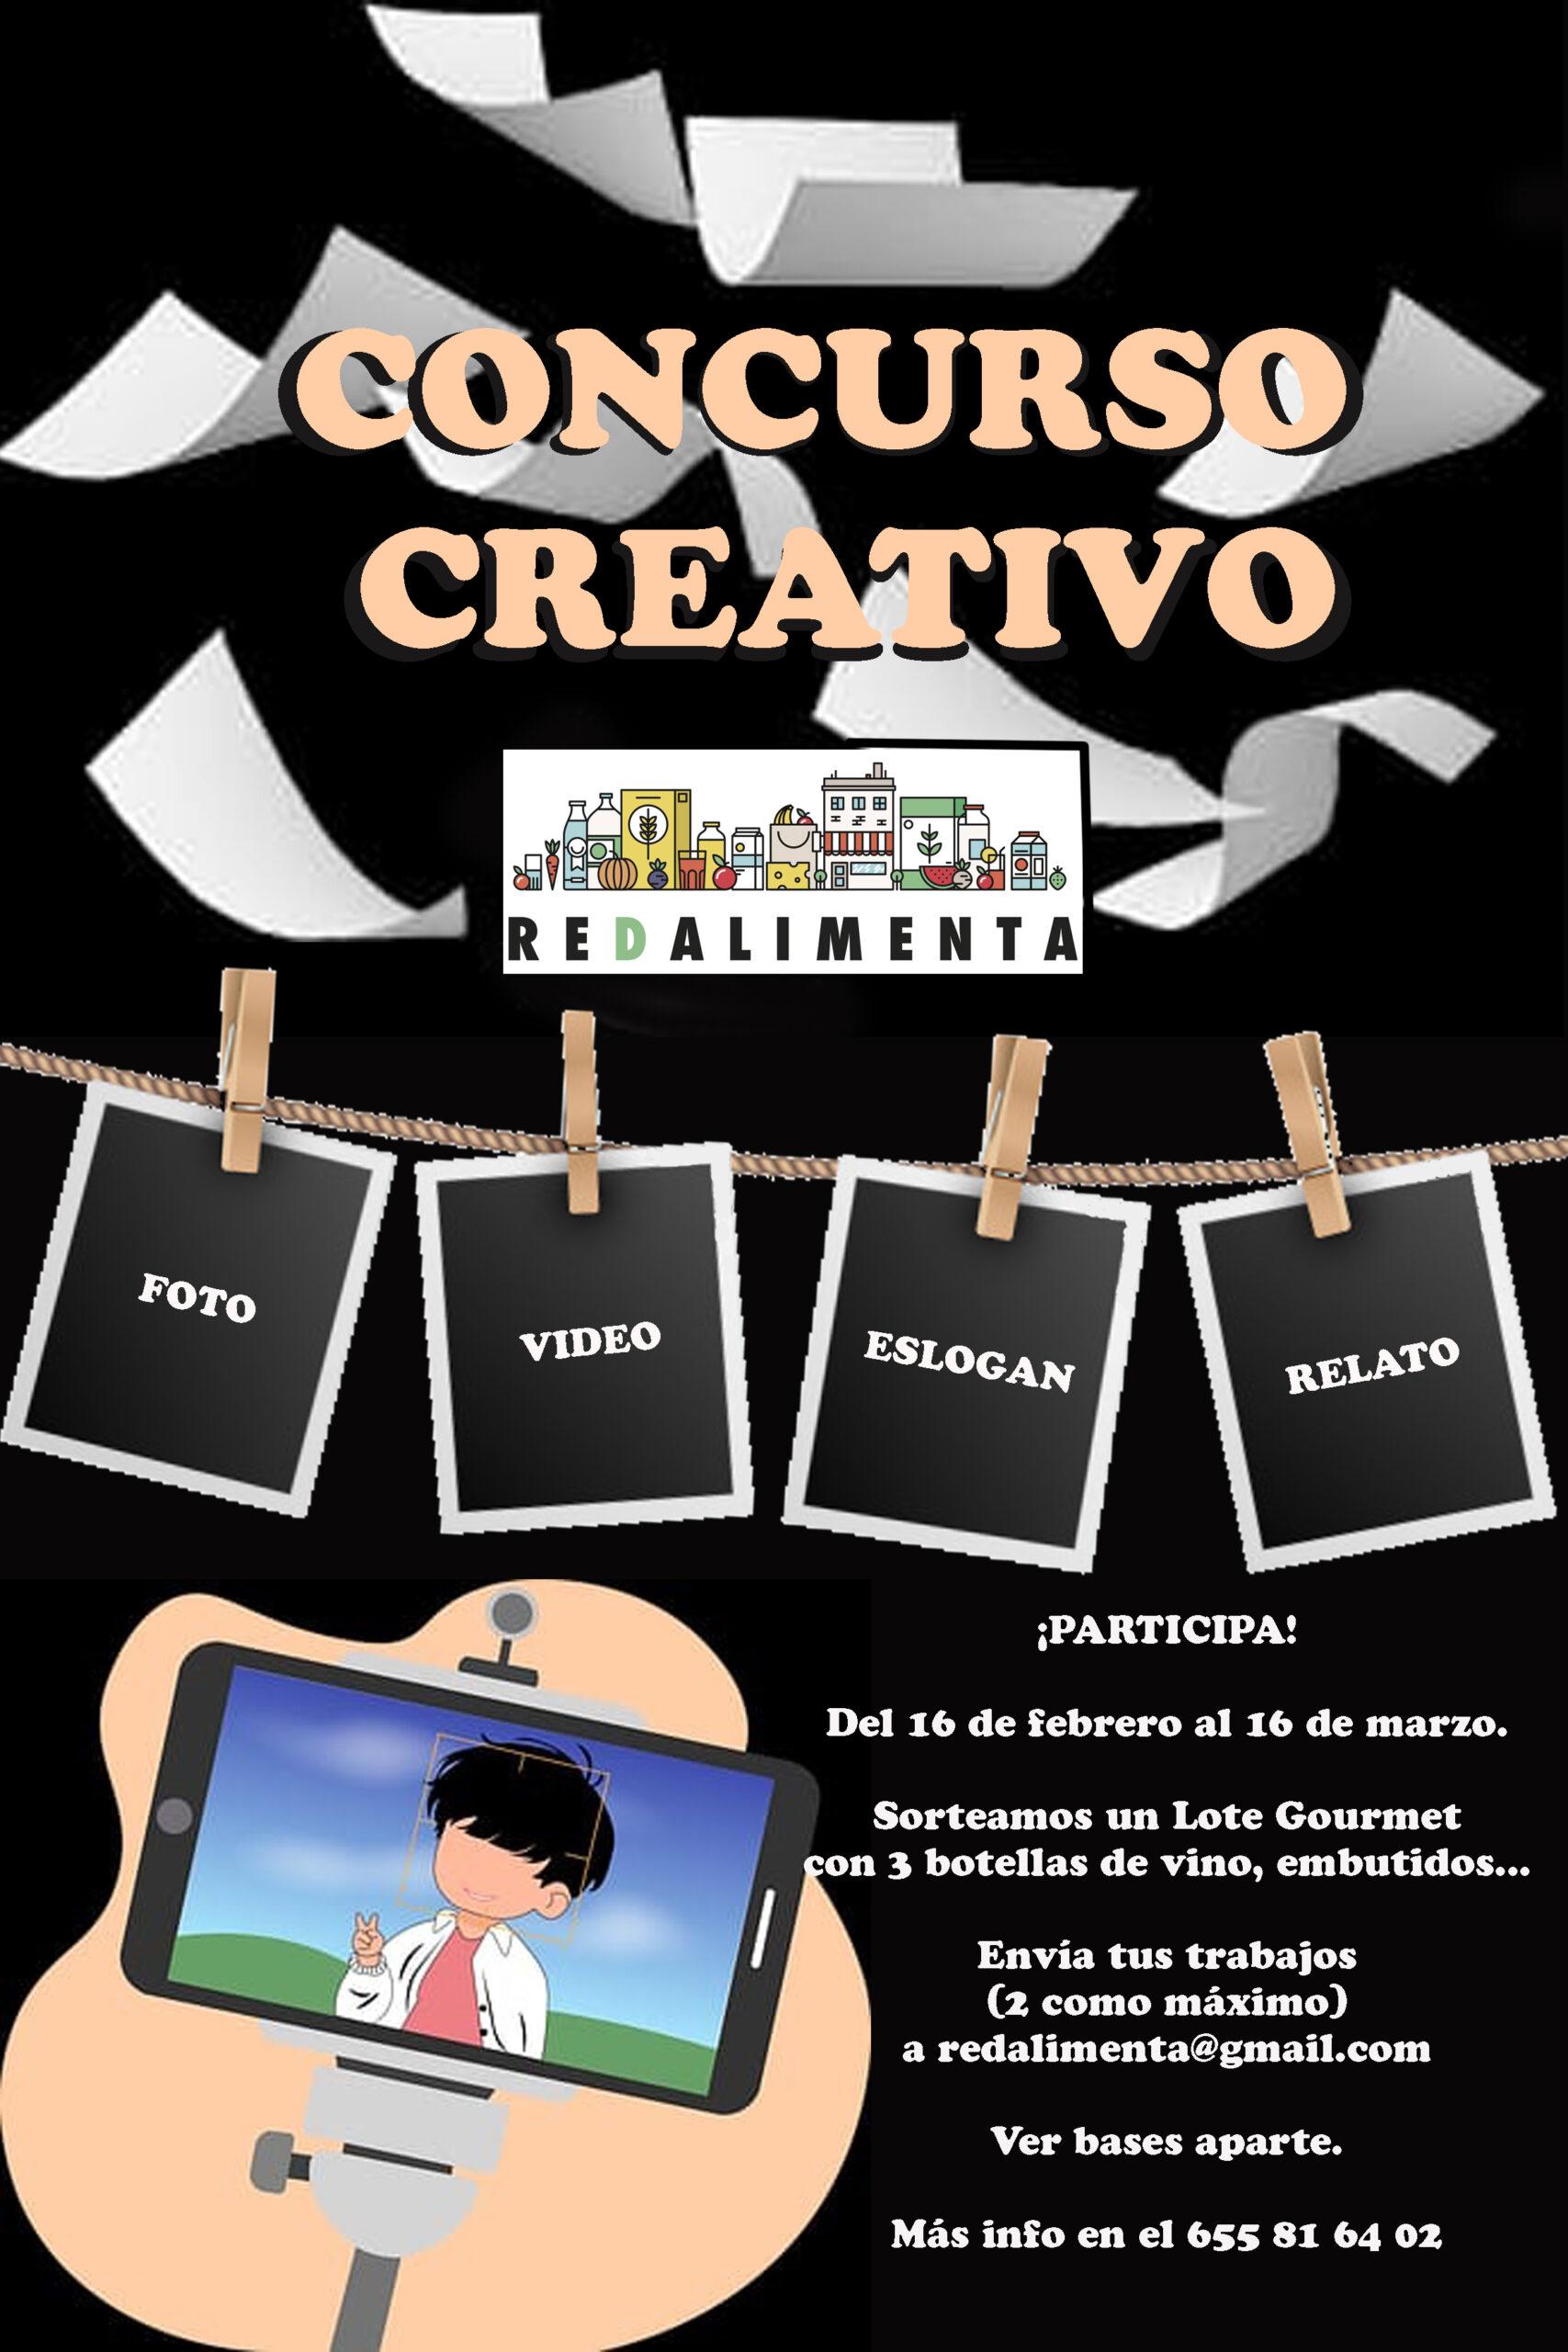 Concurso Creativo